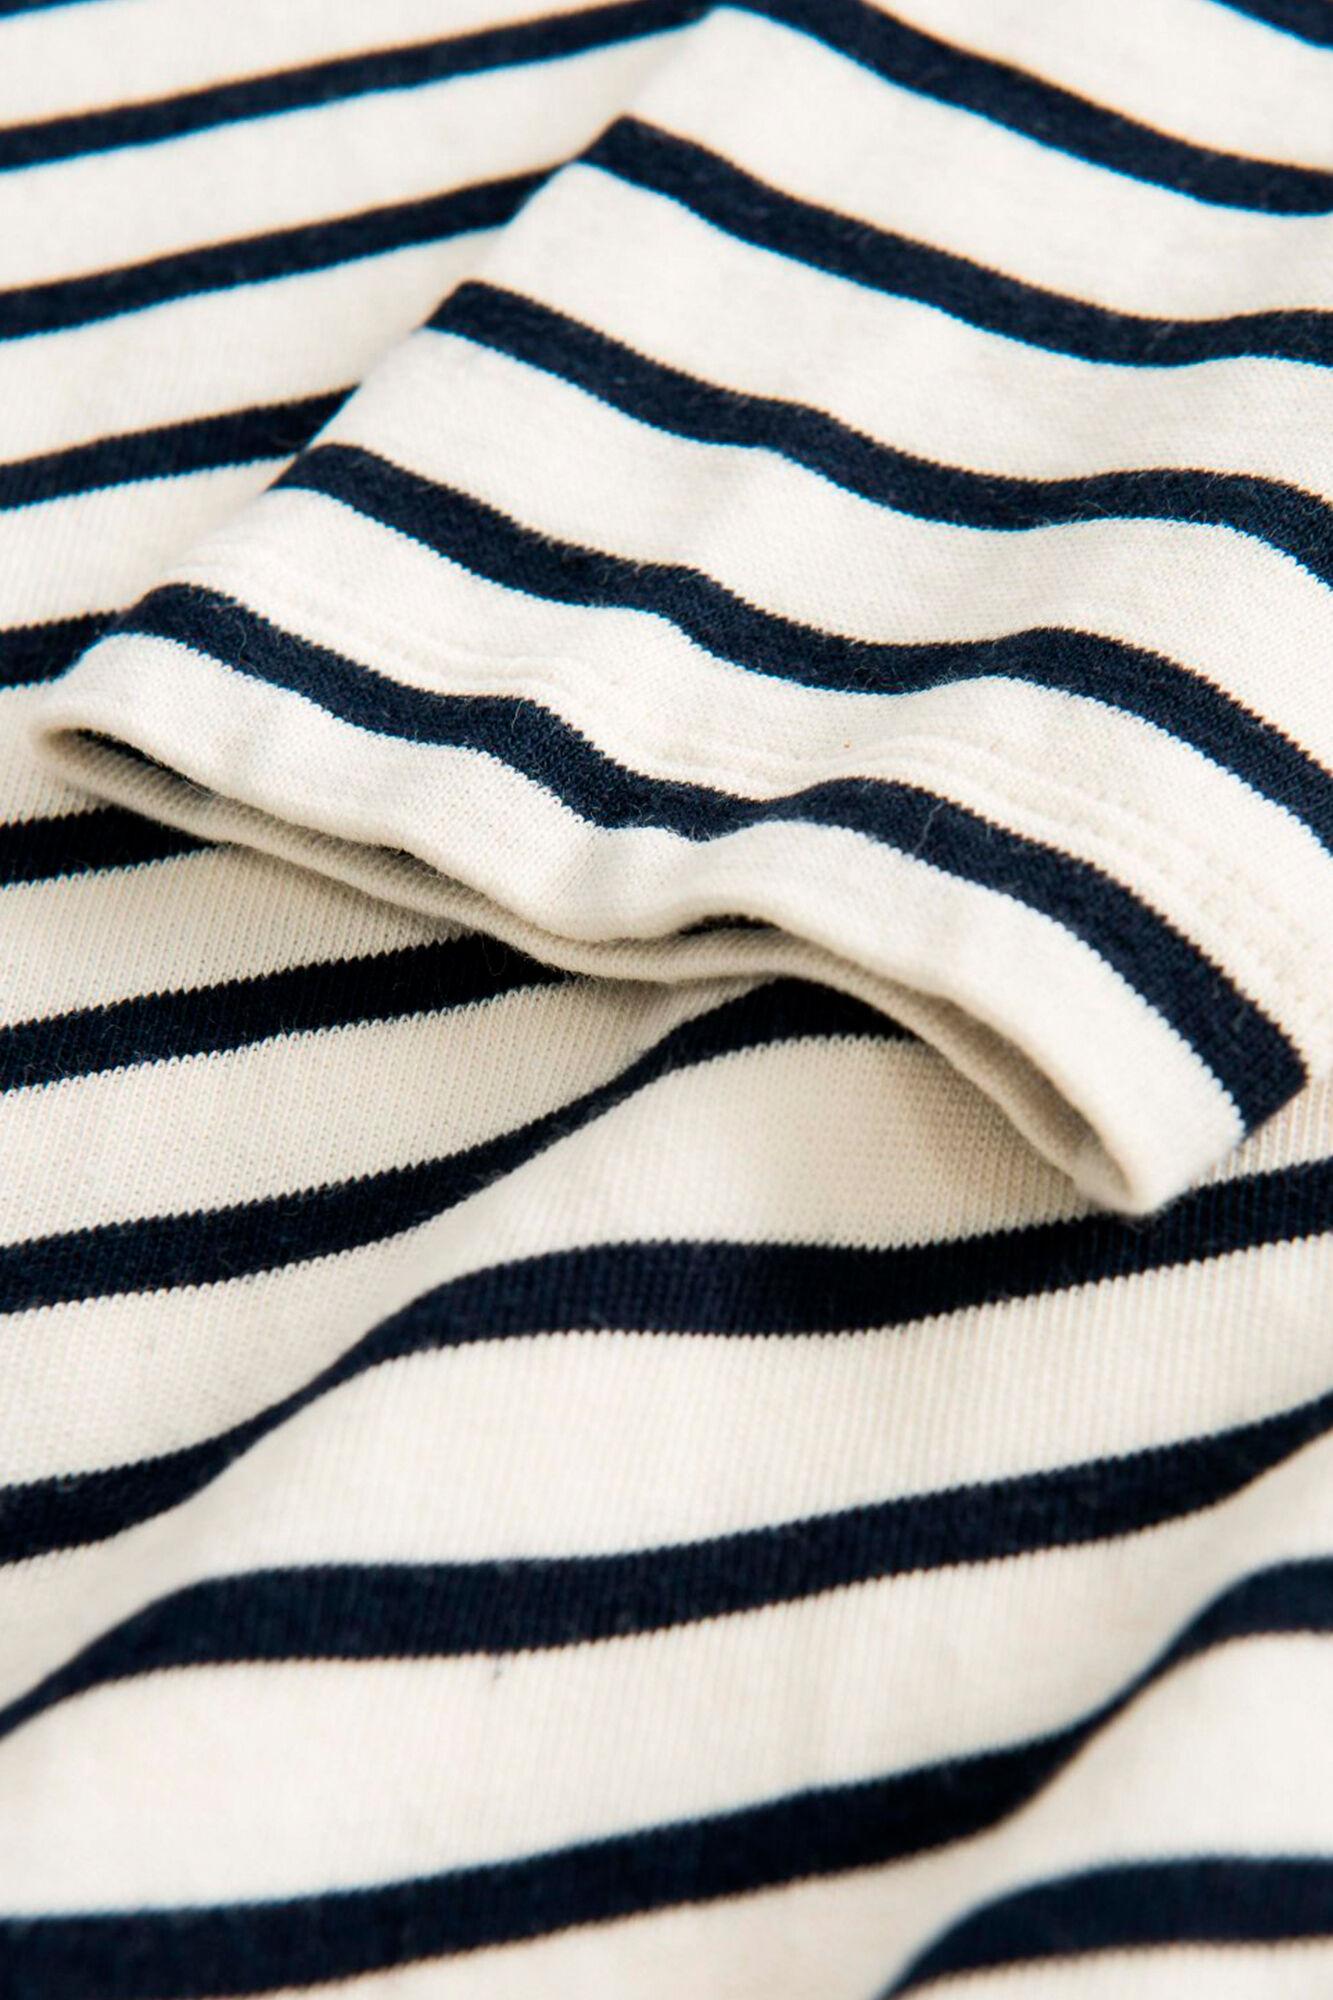 Moa long sleeve, OFF-WHITE/NAVY STRIPES